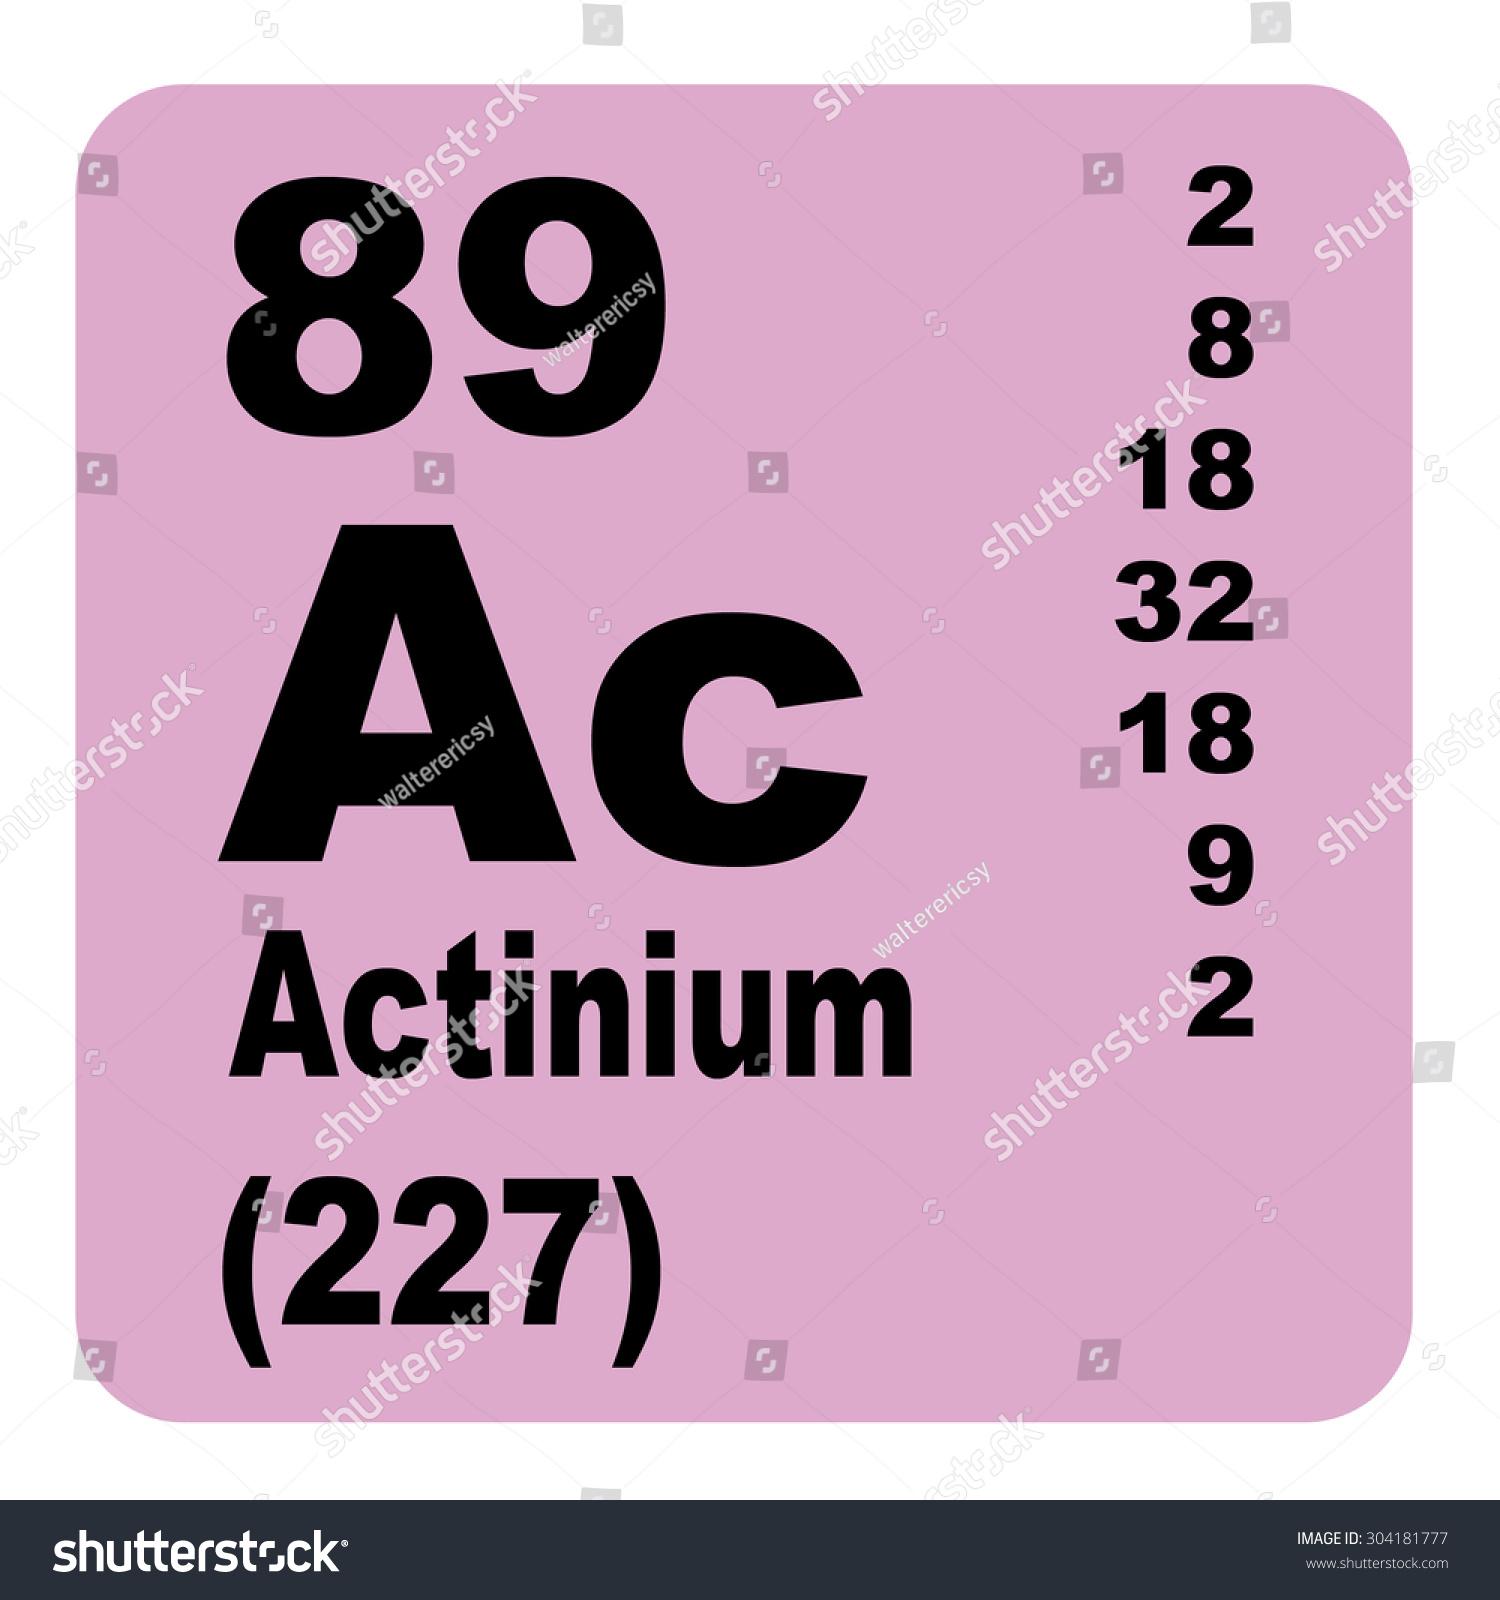 Actinium periodic table elements stock illustration 304181777 actinium periodic table of elements gamestrikefo Choice Image